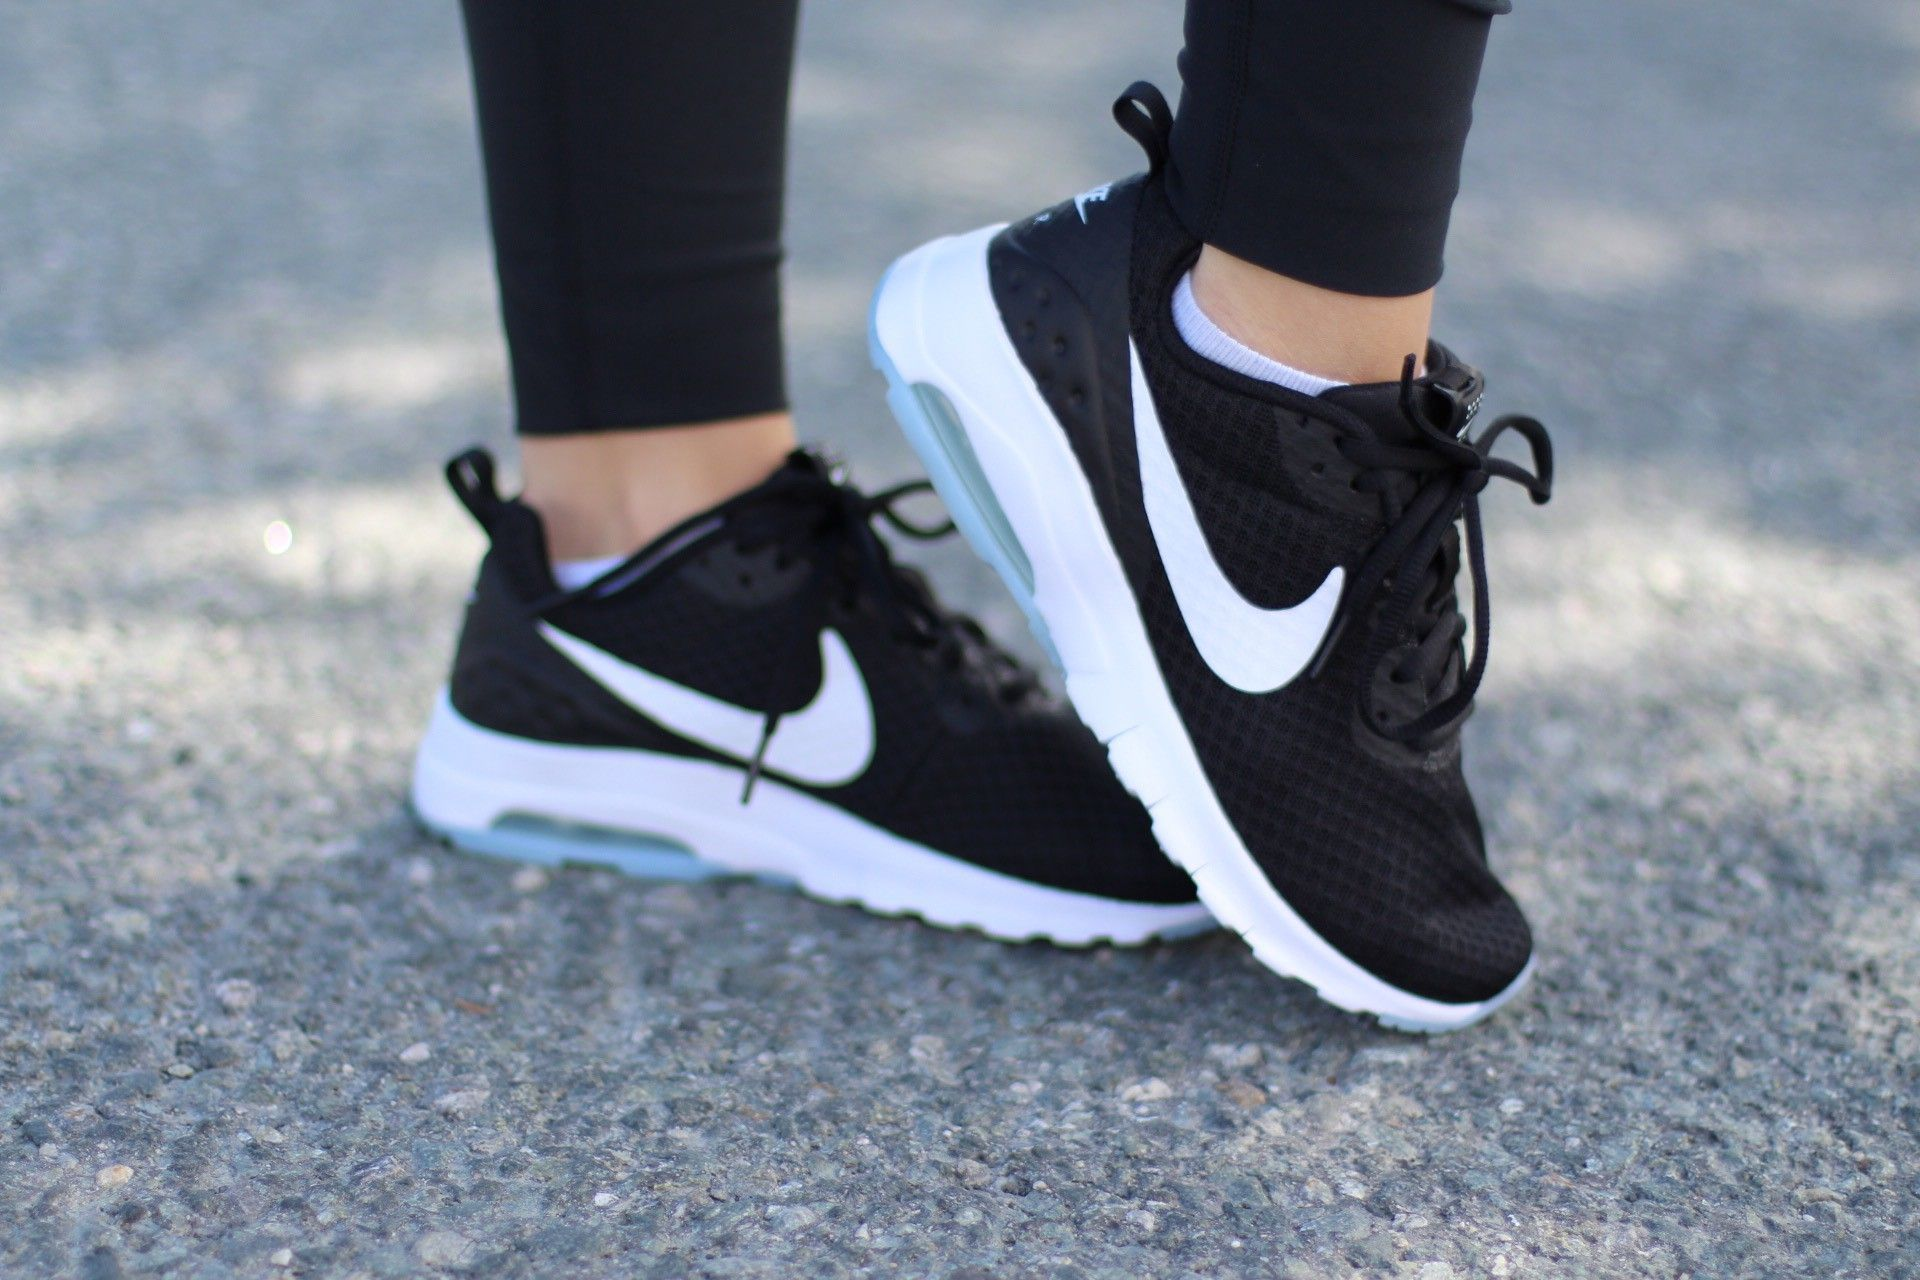 sale retailer 557c0 ad968 Nike Air Max Motion LW - Svart   GetInspired.no